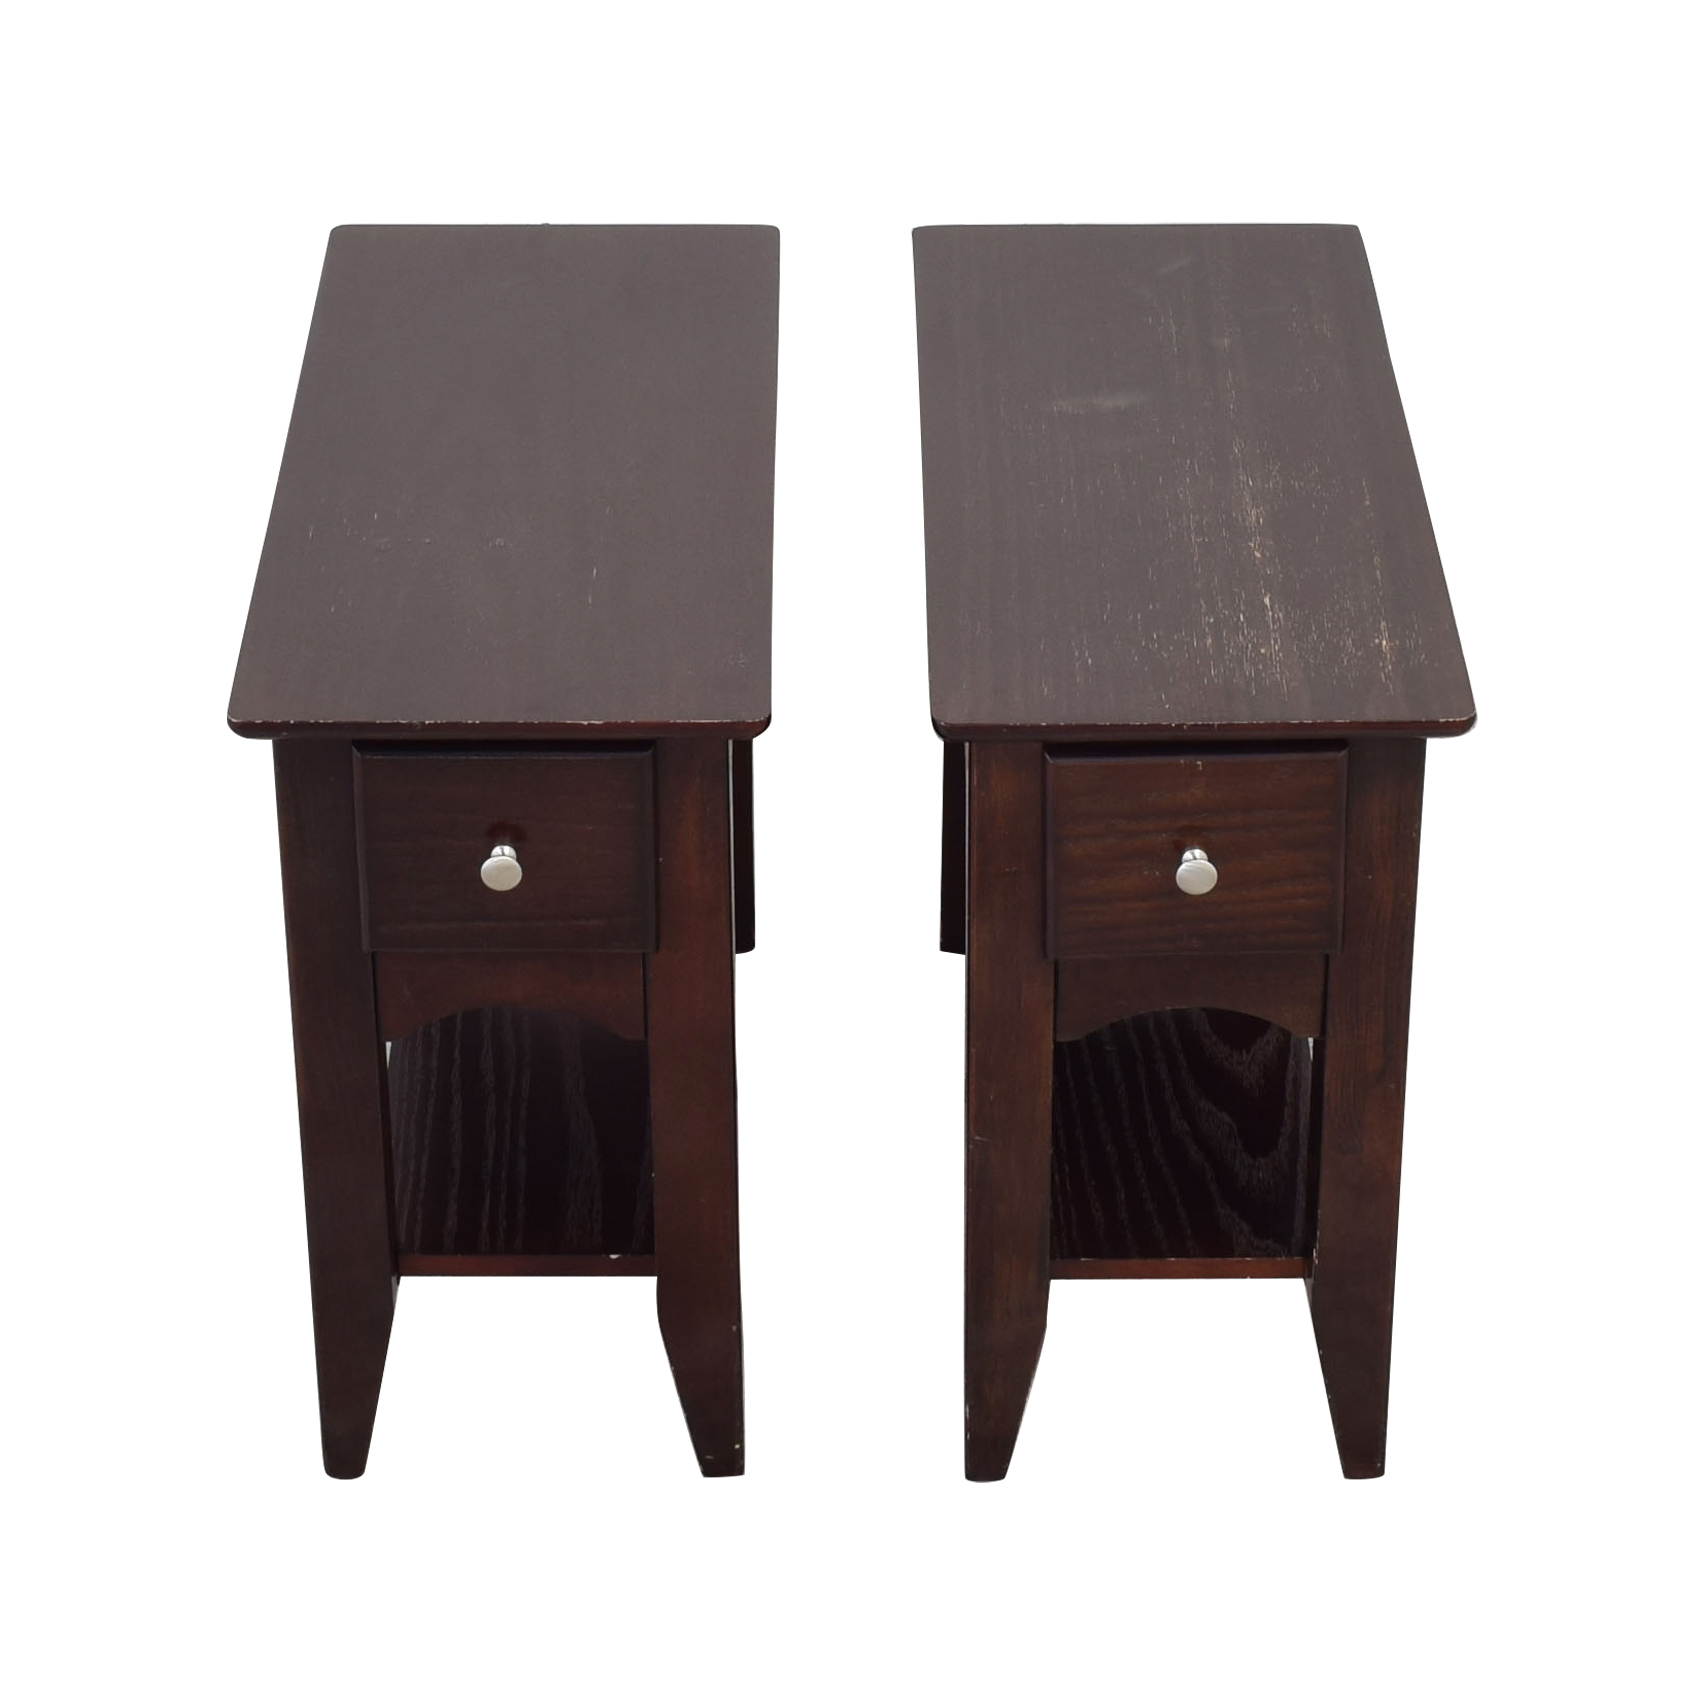 Riverside Furniture Riverside Furniture Metro II End Tables dark brown